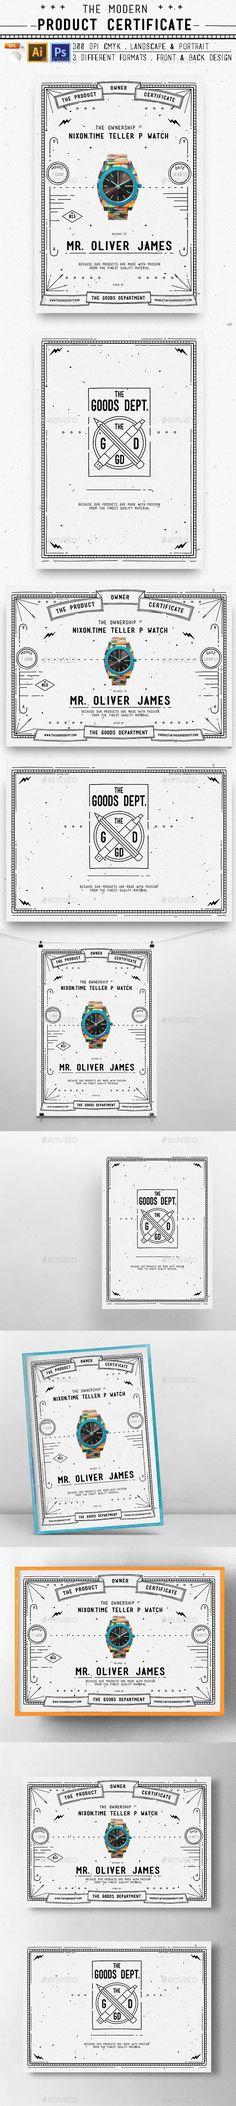 Certificate Template Certificate, Template and Infographic templates - certificate template software